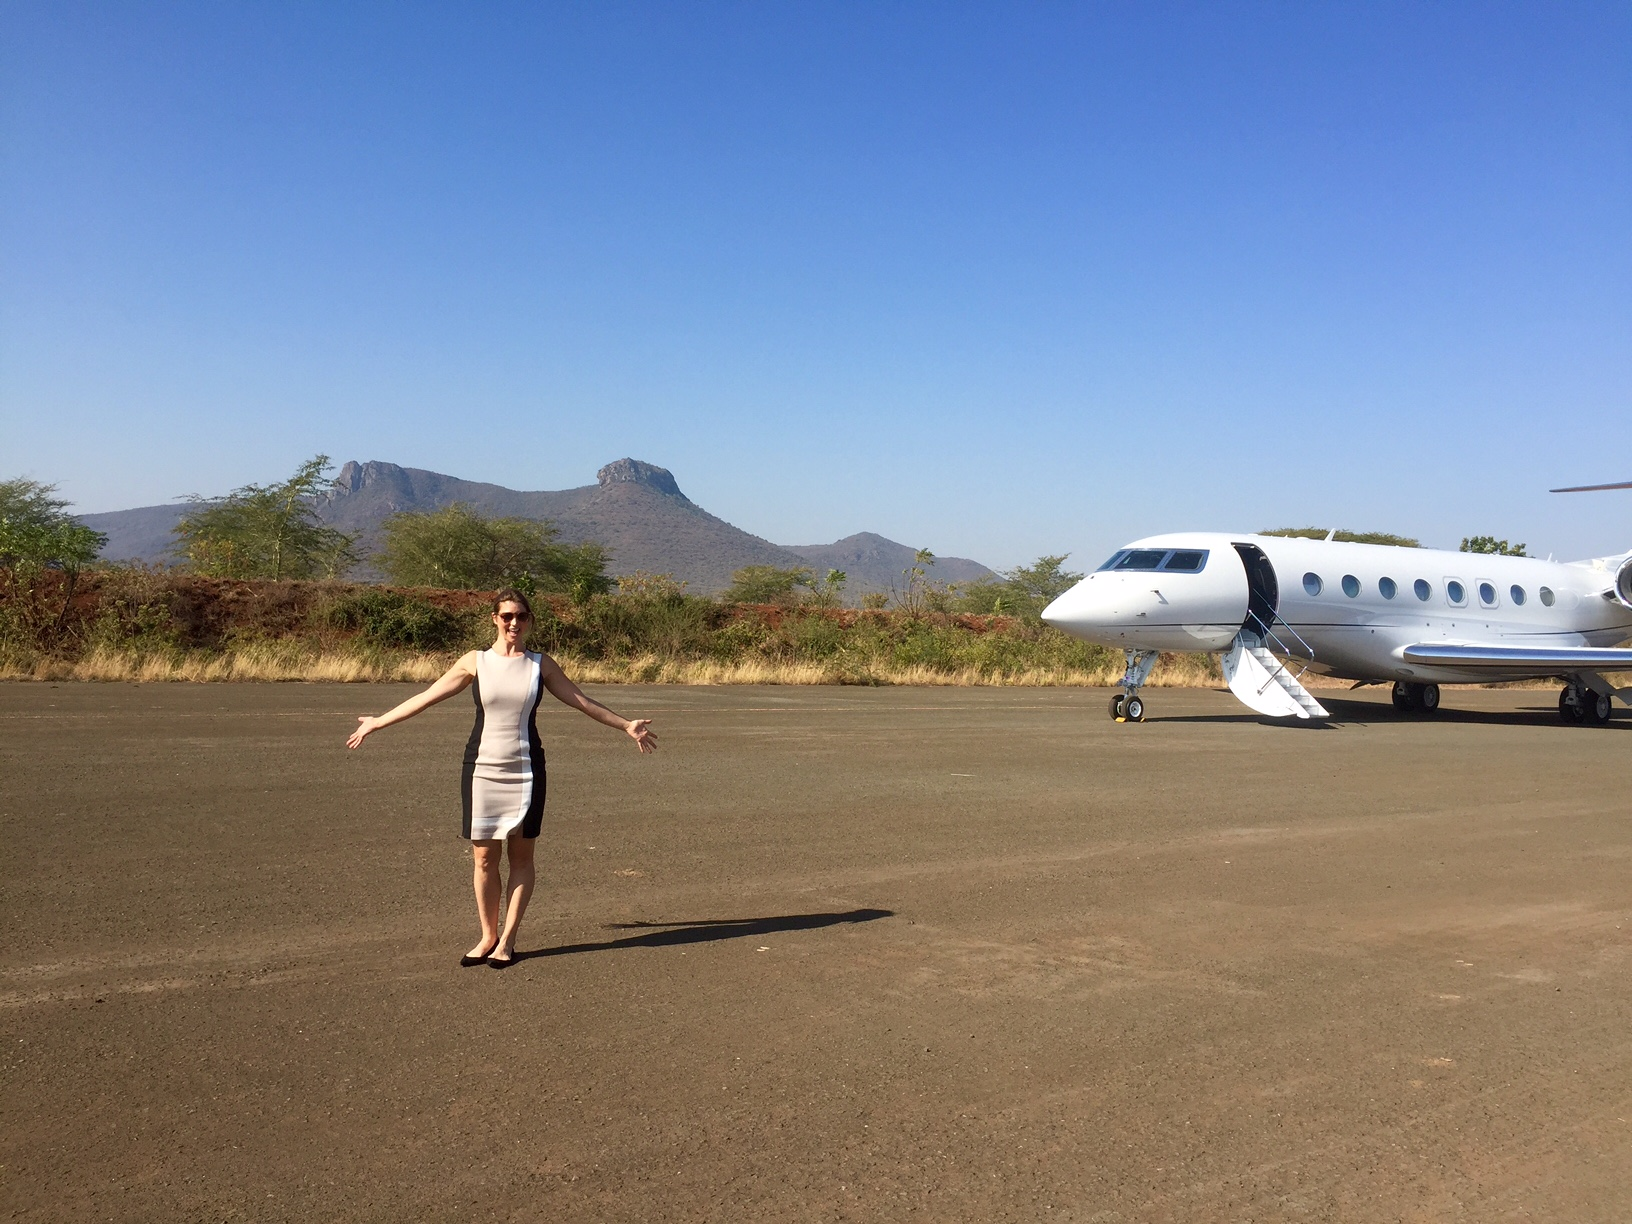 Certified SkyAngel, Kate on a flight to Mkuzi Mkuzi, Africa just four weeks after graduating from SkyAngels SKYacademy